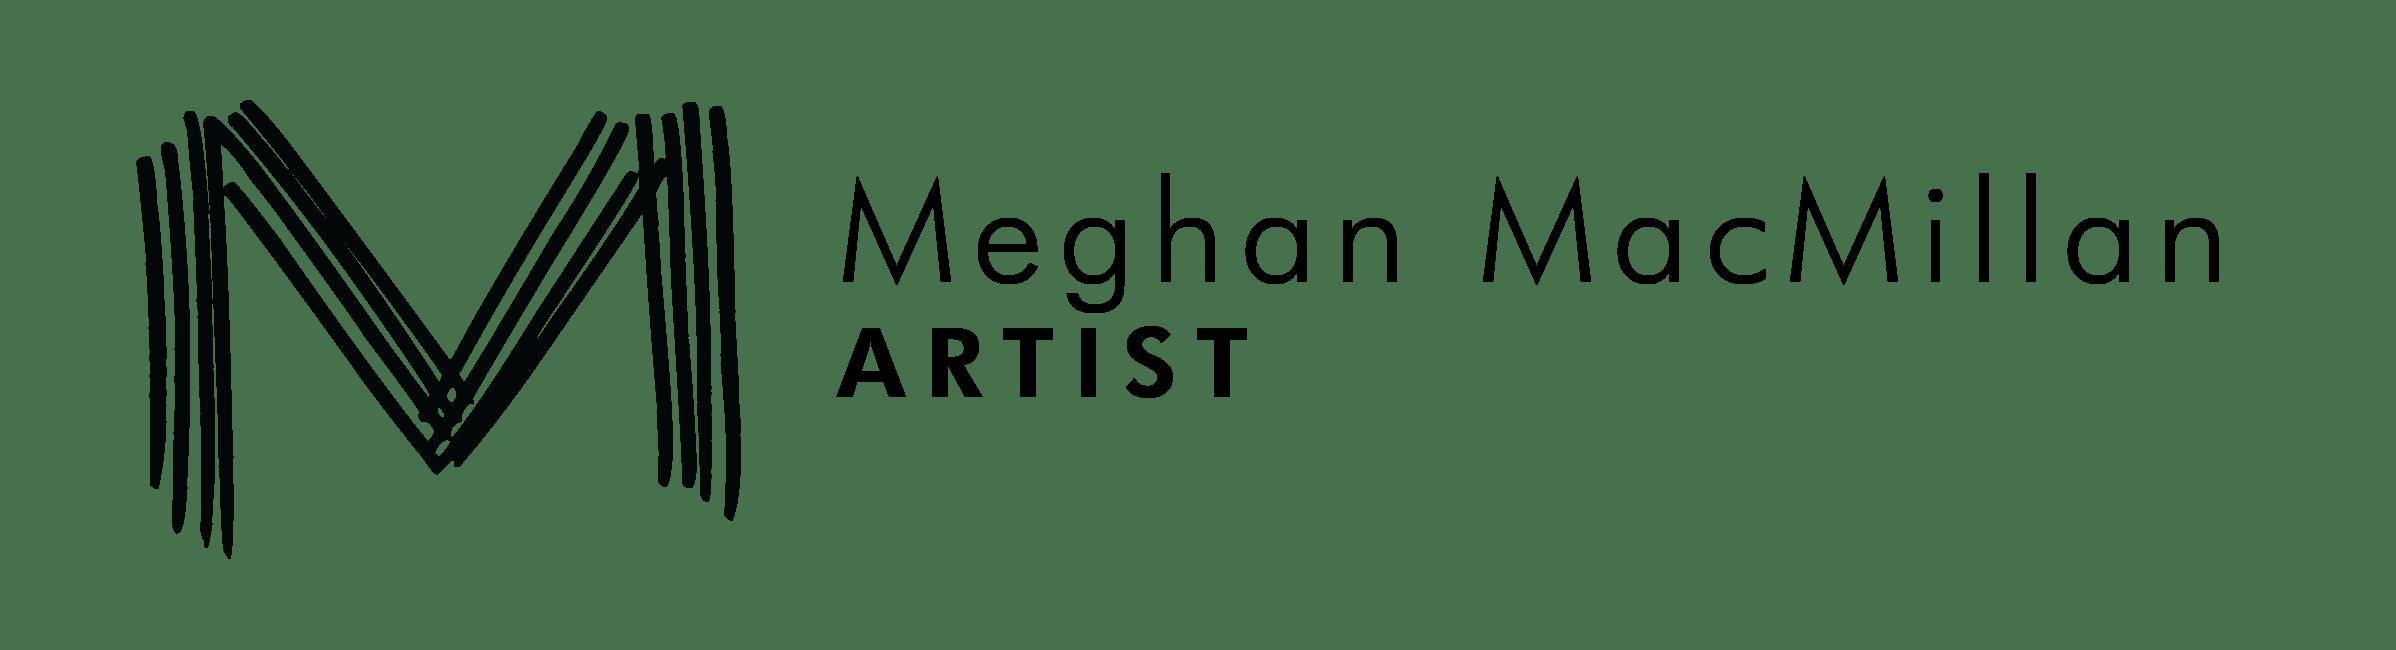 Meghan MacMillan, Artist